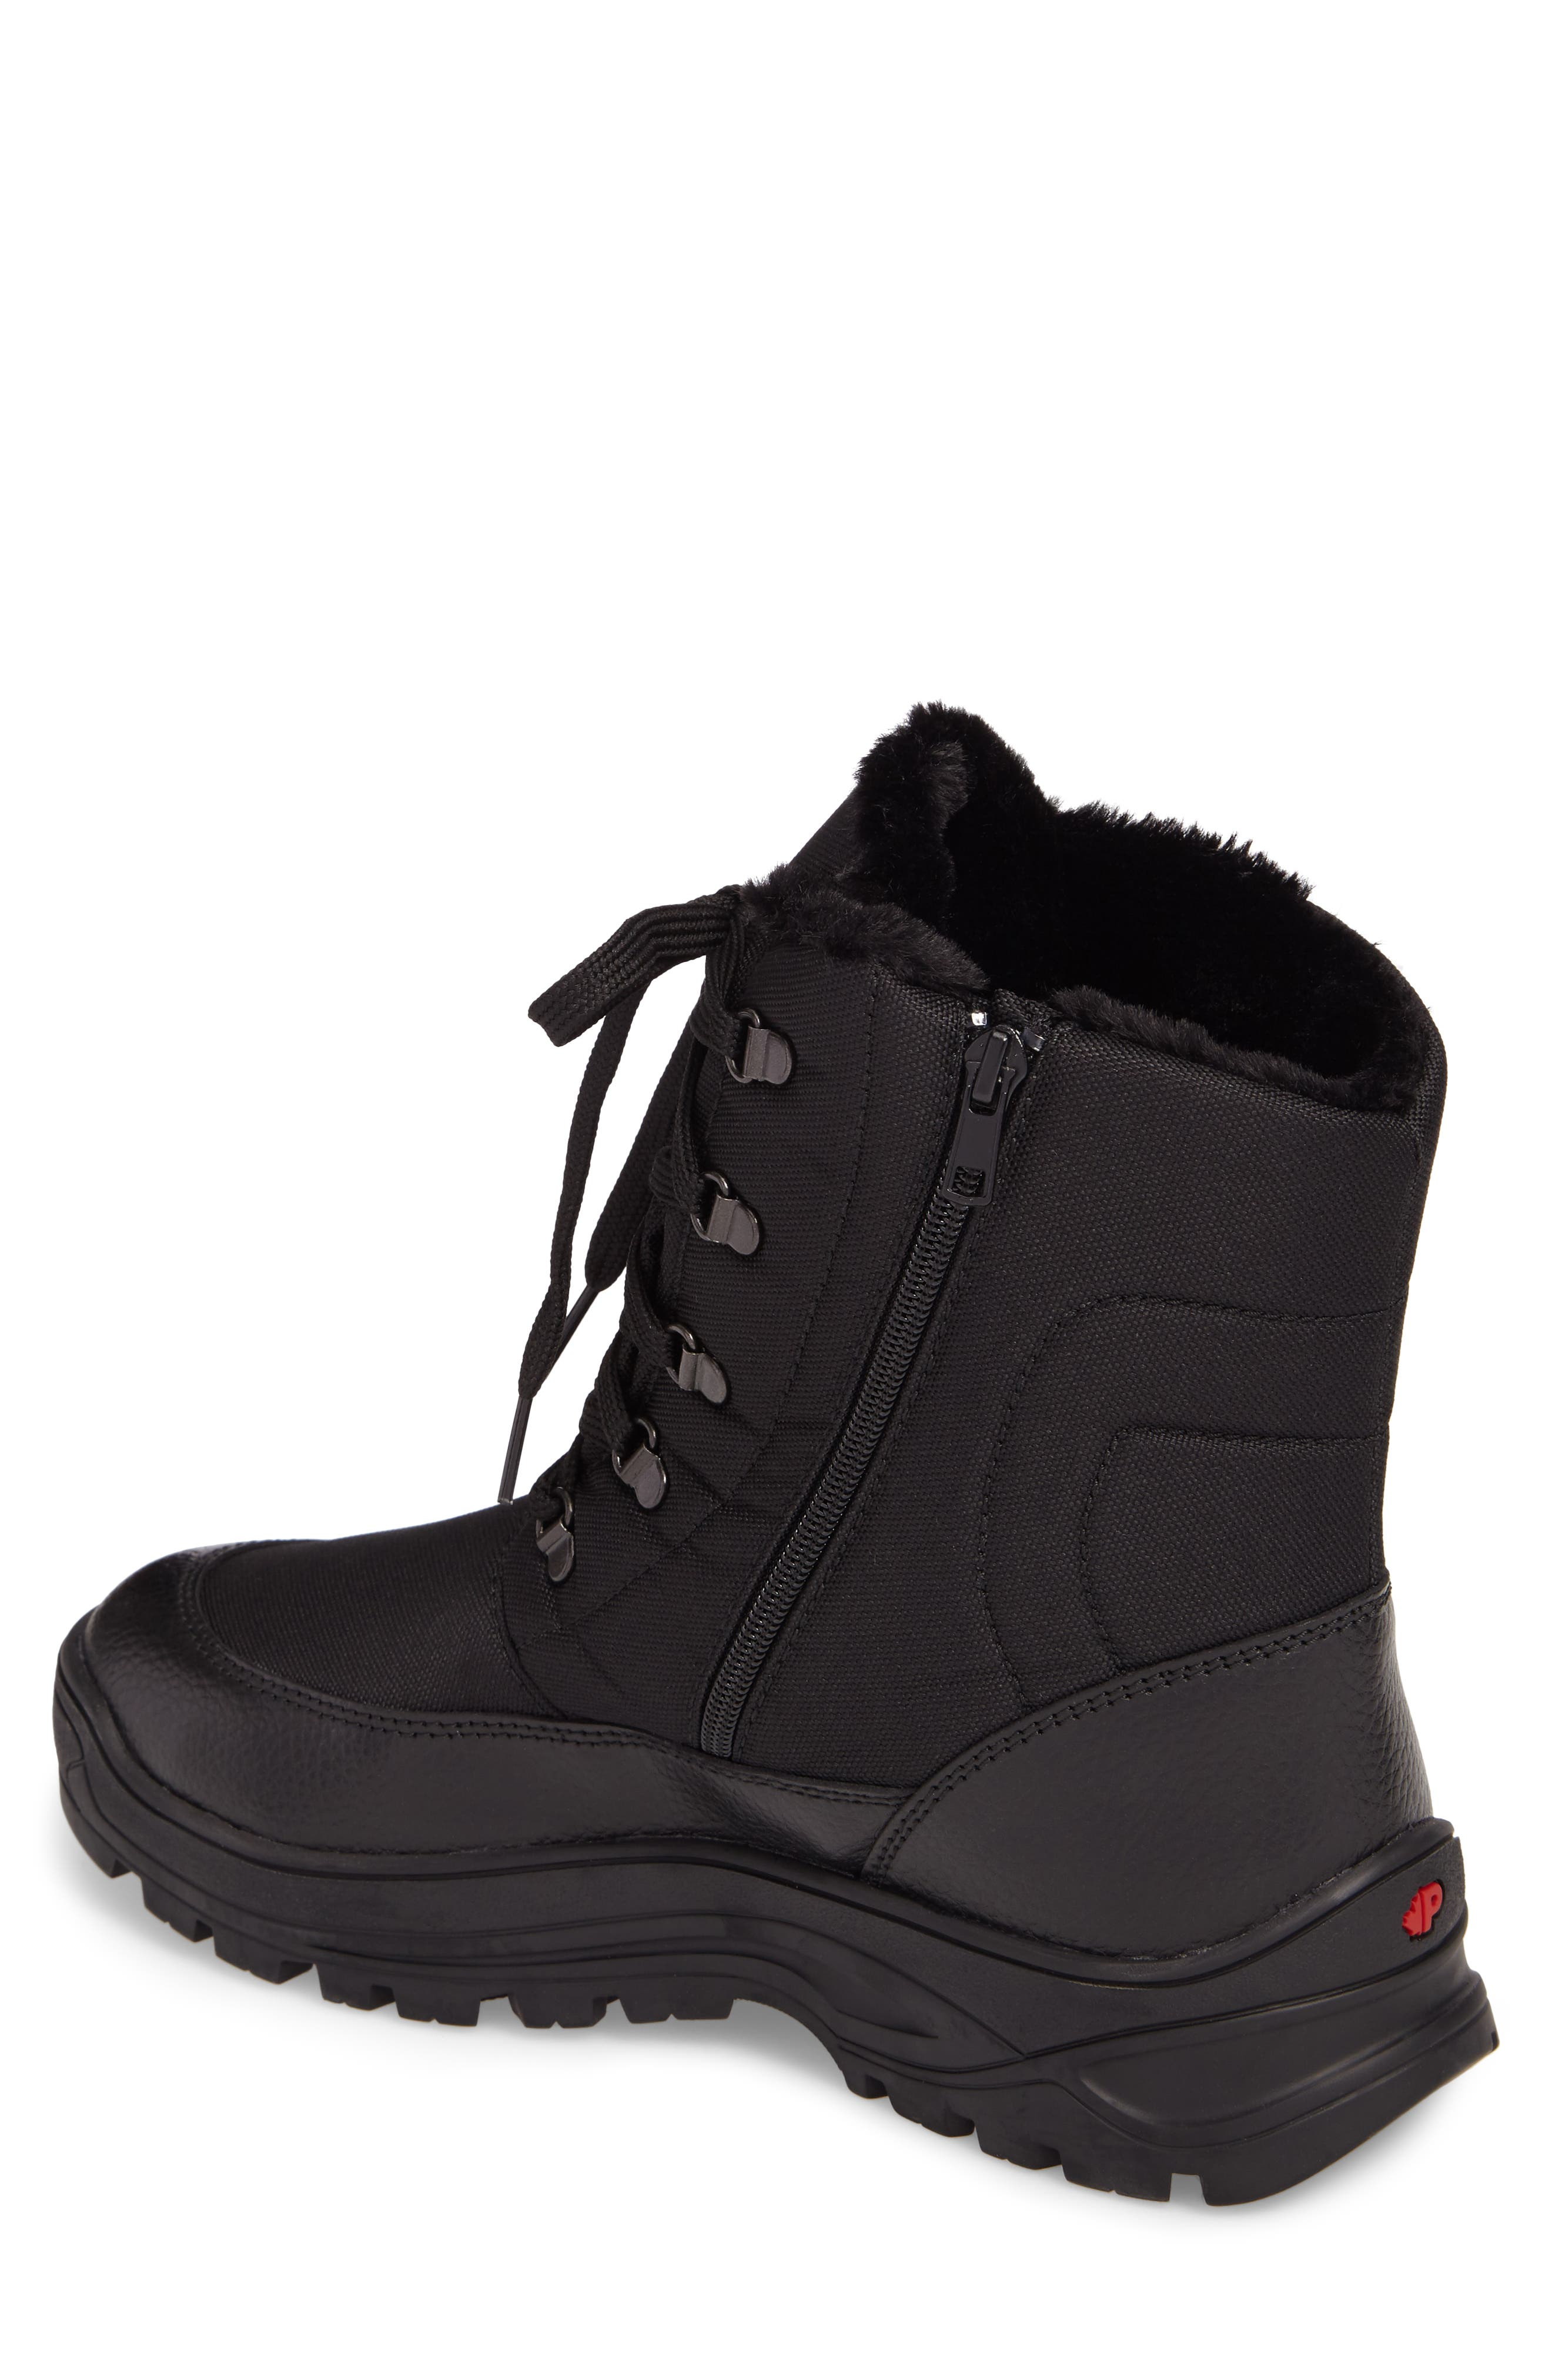 Trigger Winter Boot,                             Alternate thumbnail 2, color,                             Black